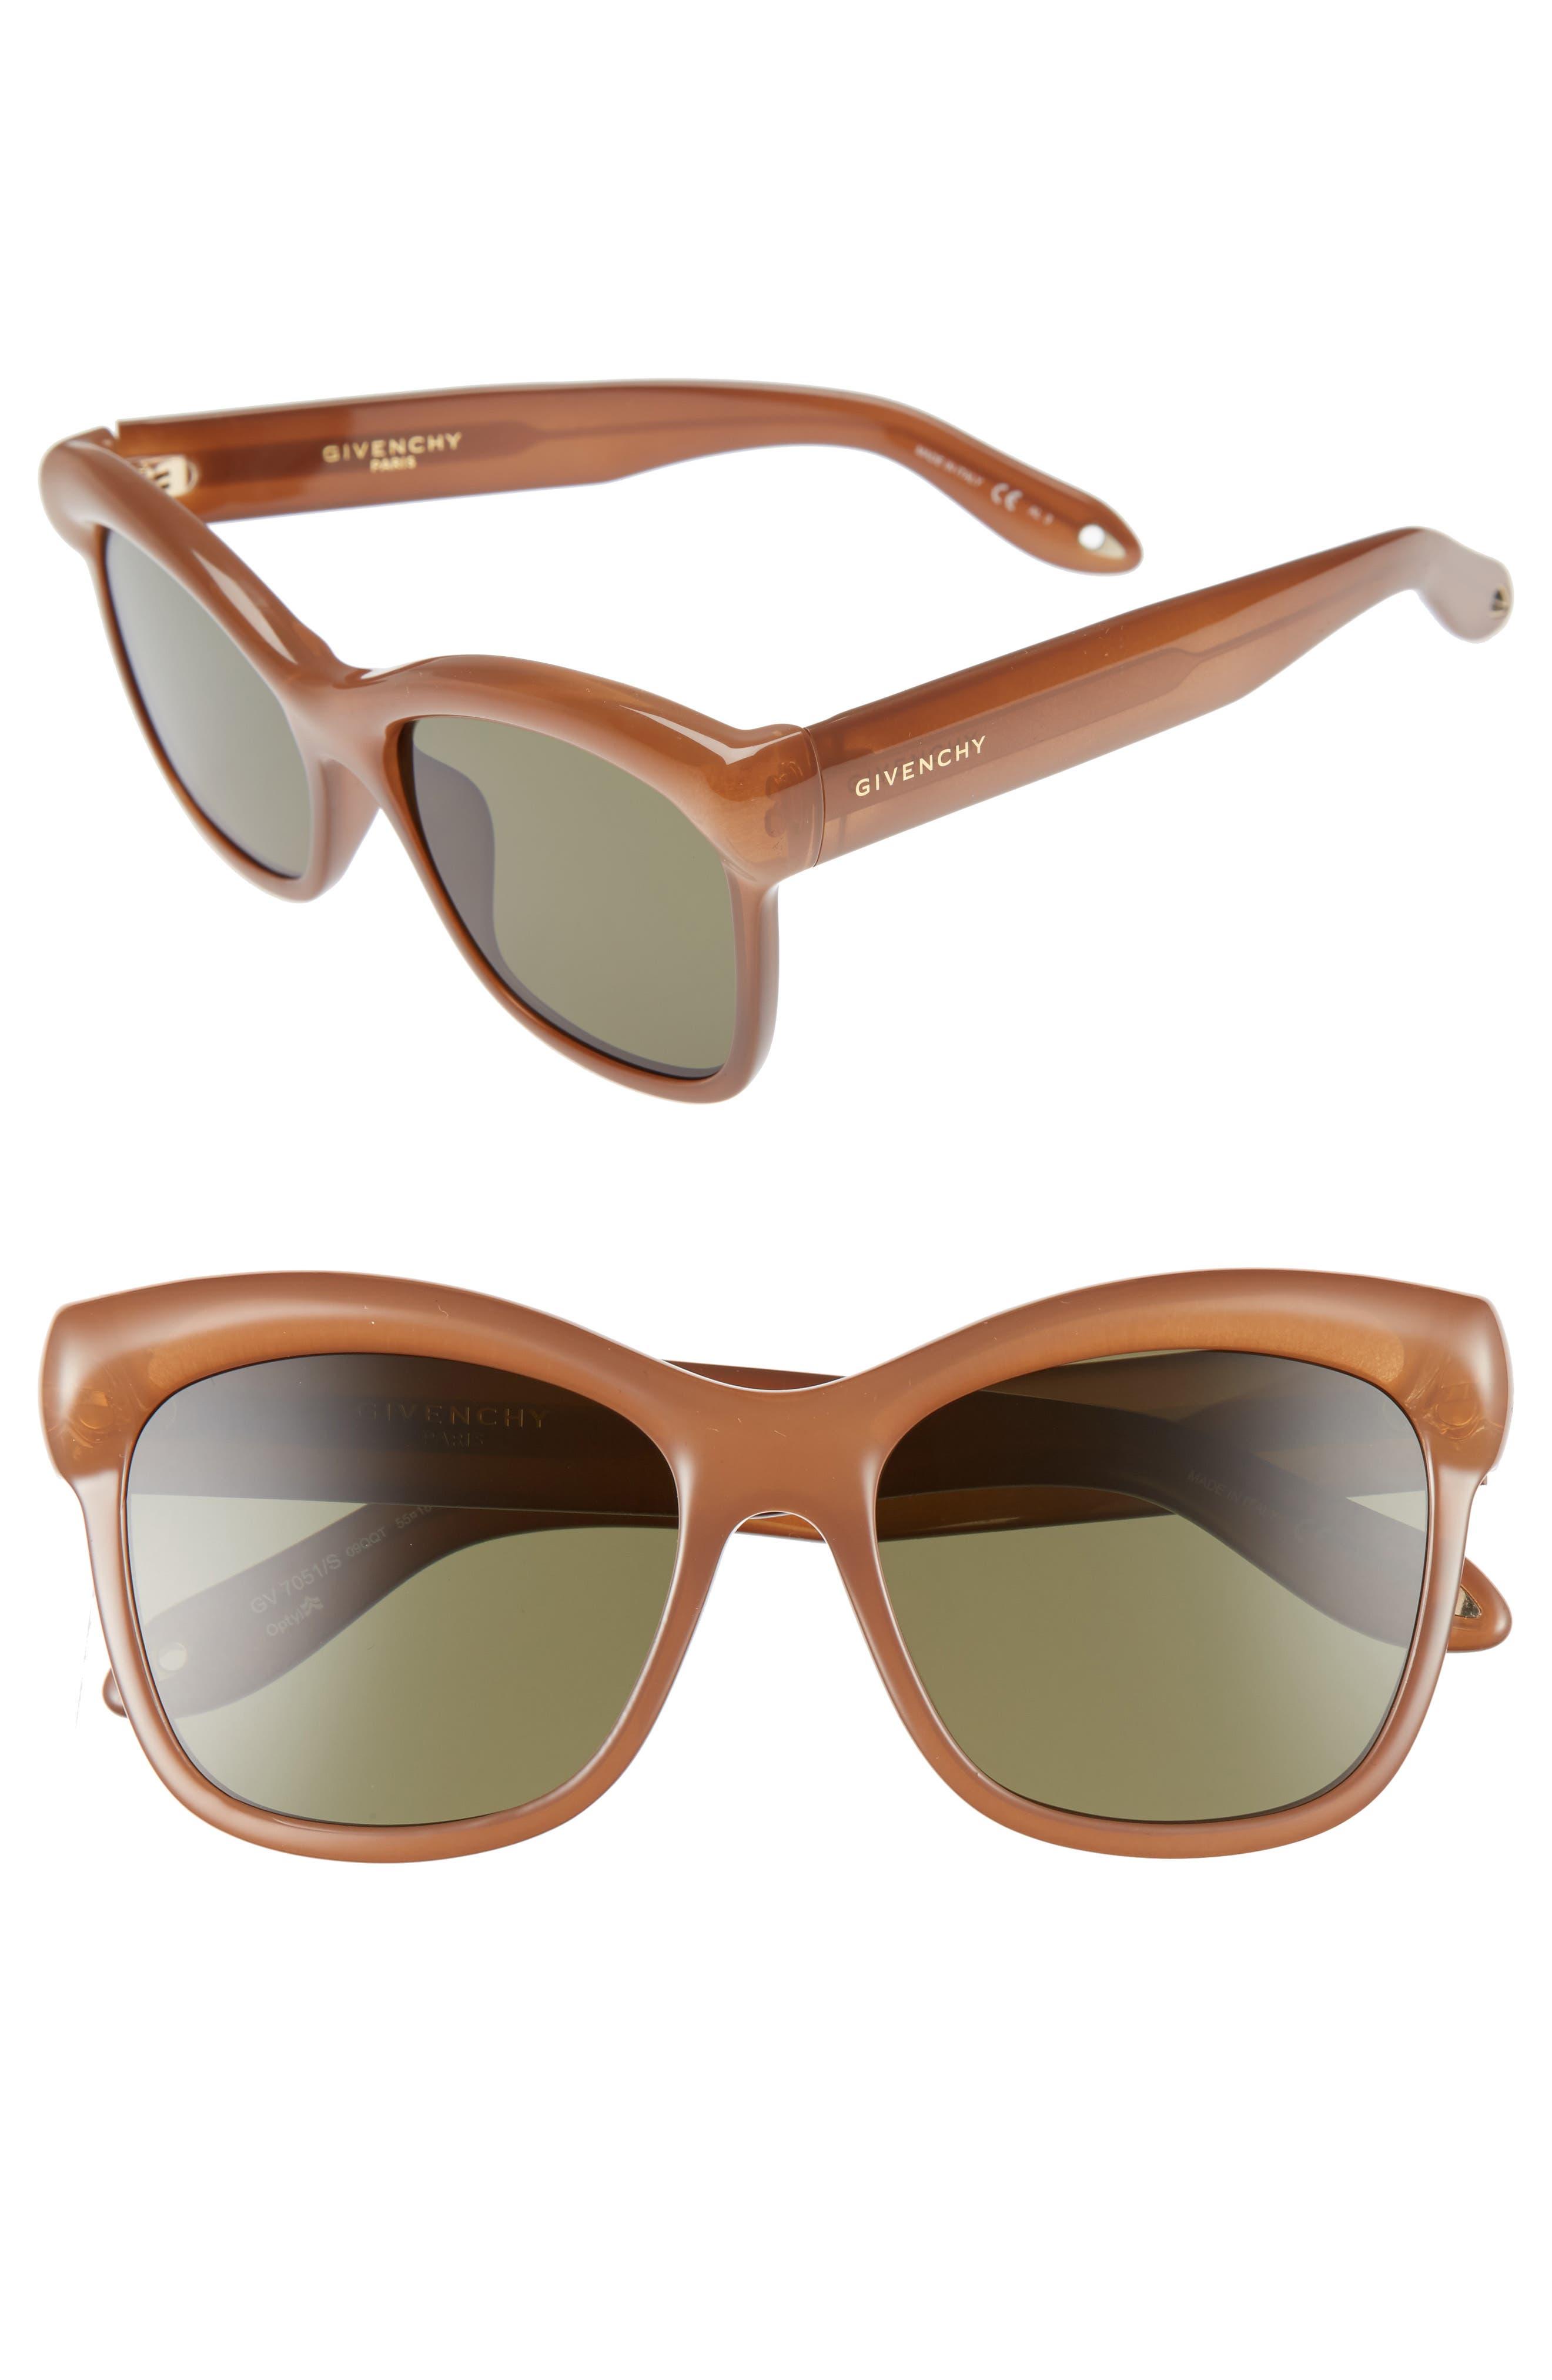 Main Image - Givenchy 55mm Retro Sunglasses